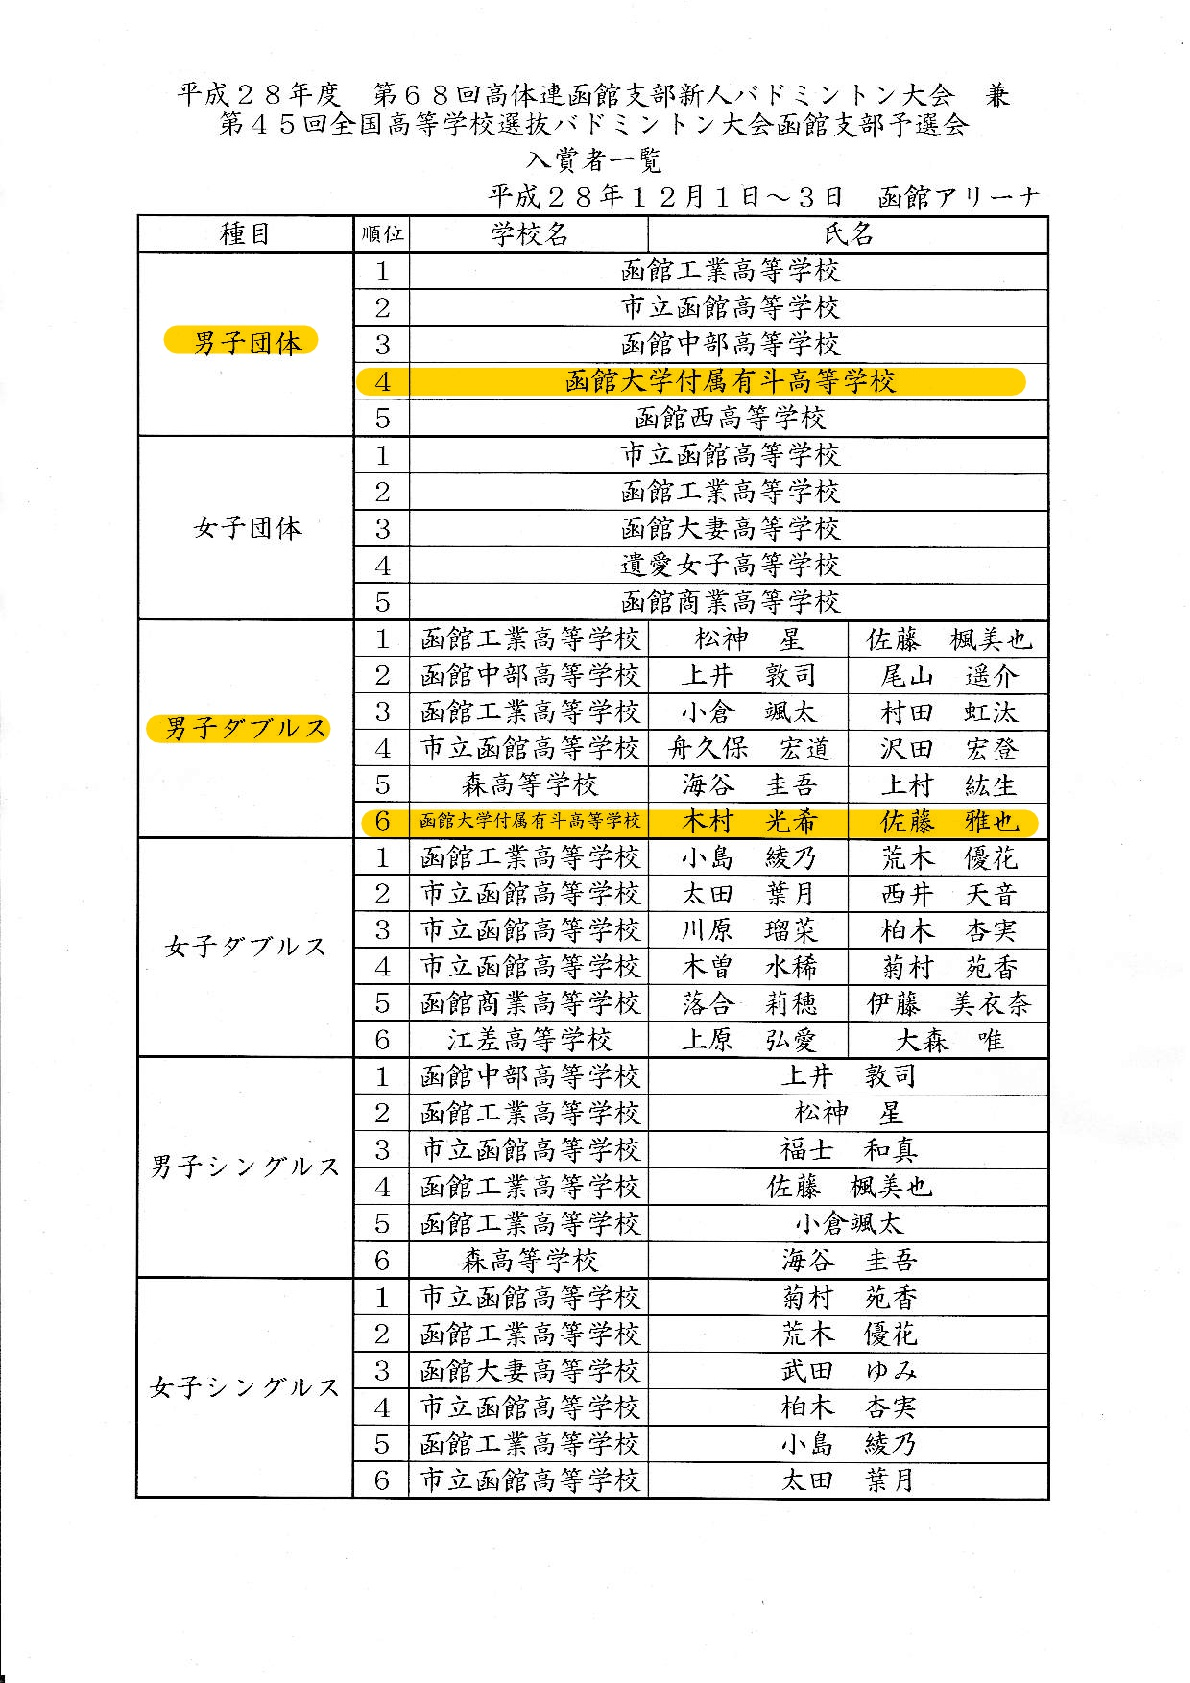 h28-koukou-sinzinsen-kekka-split-merge-001.jpg